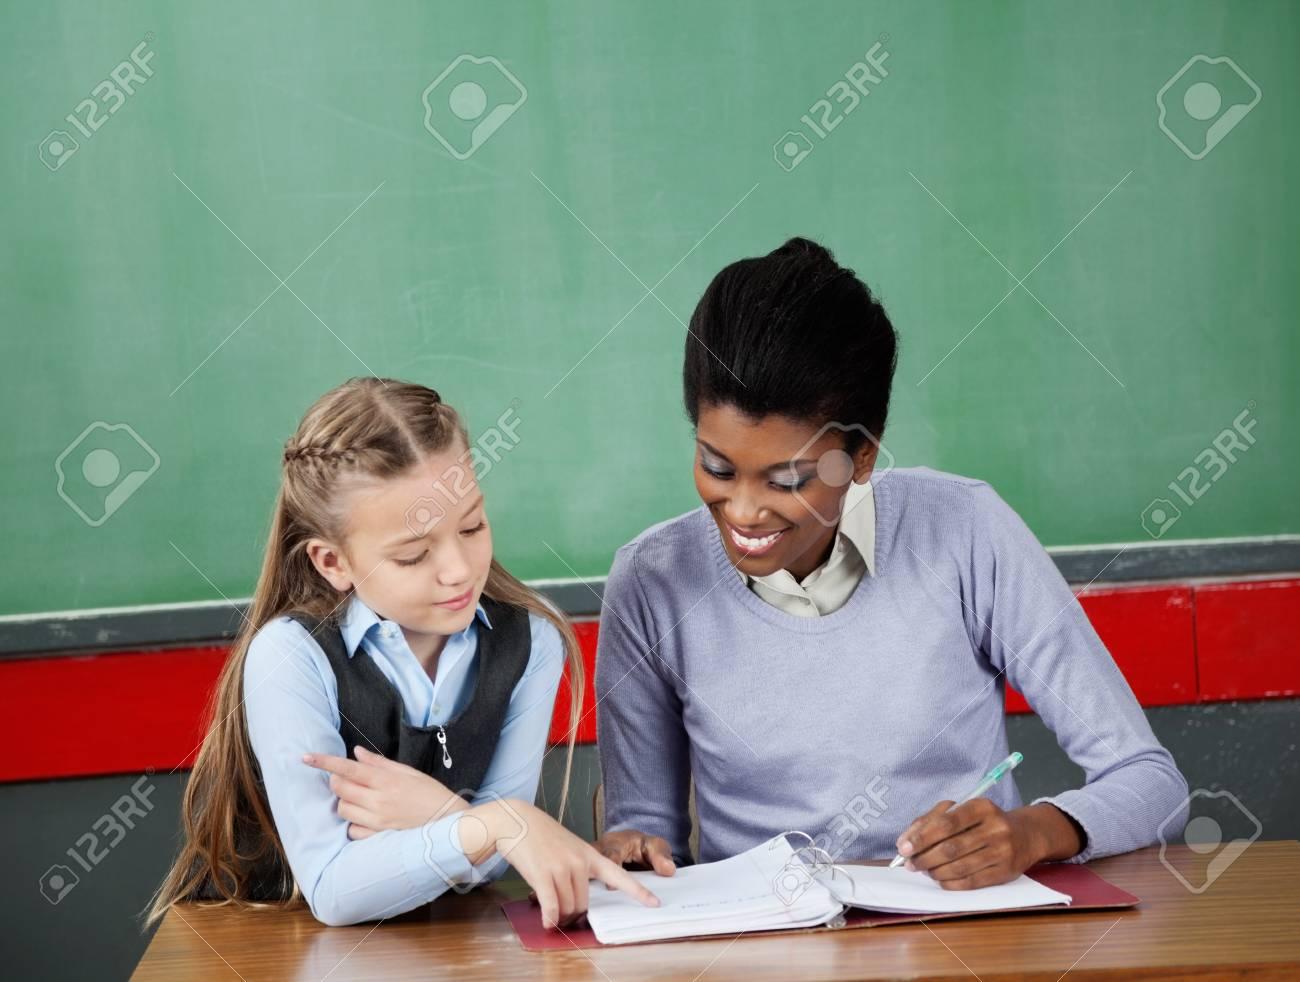 Schoolgirl Asking Question To Teacher At Desk Stock Photo 20198996